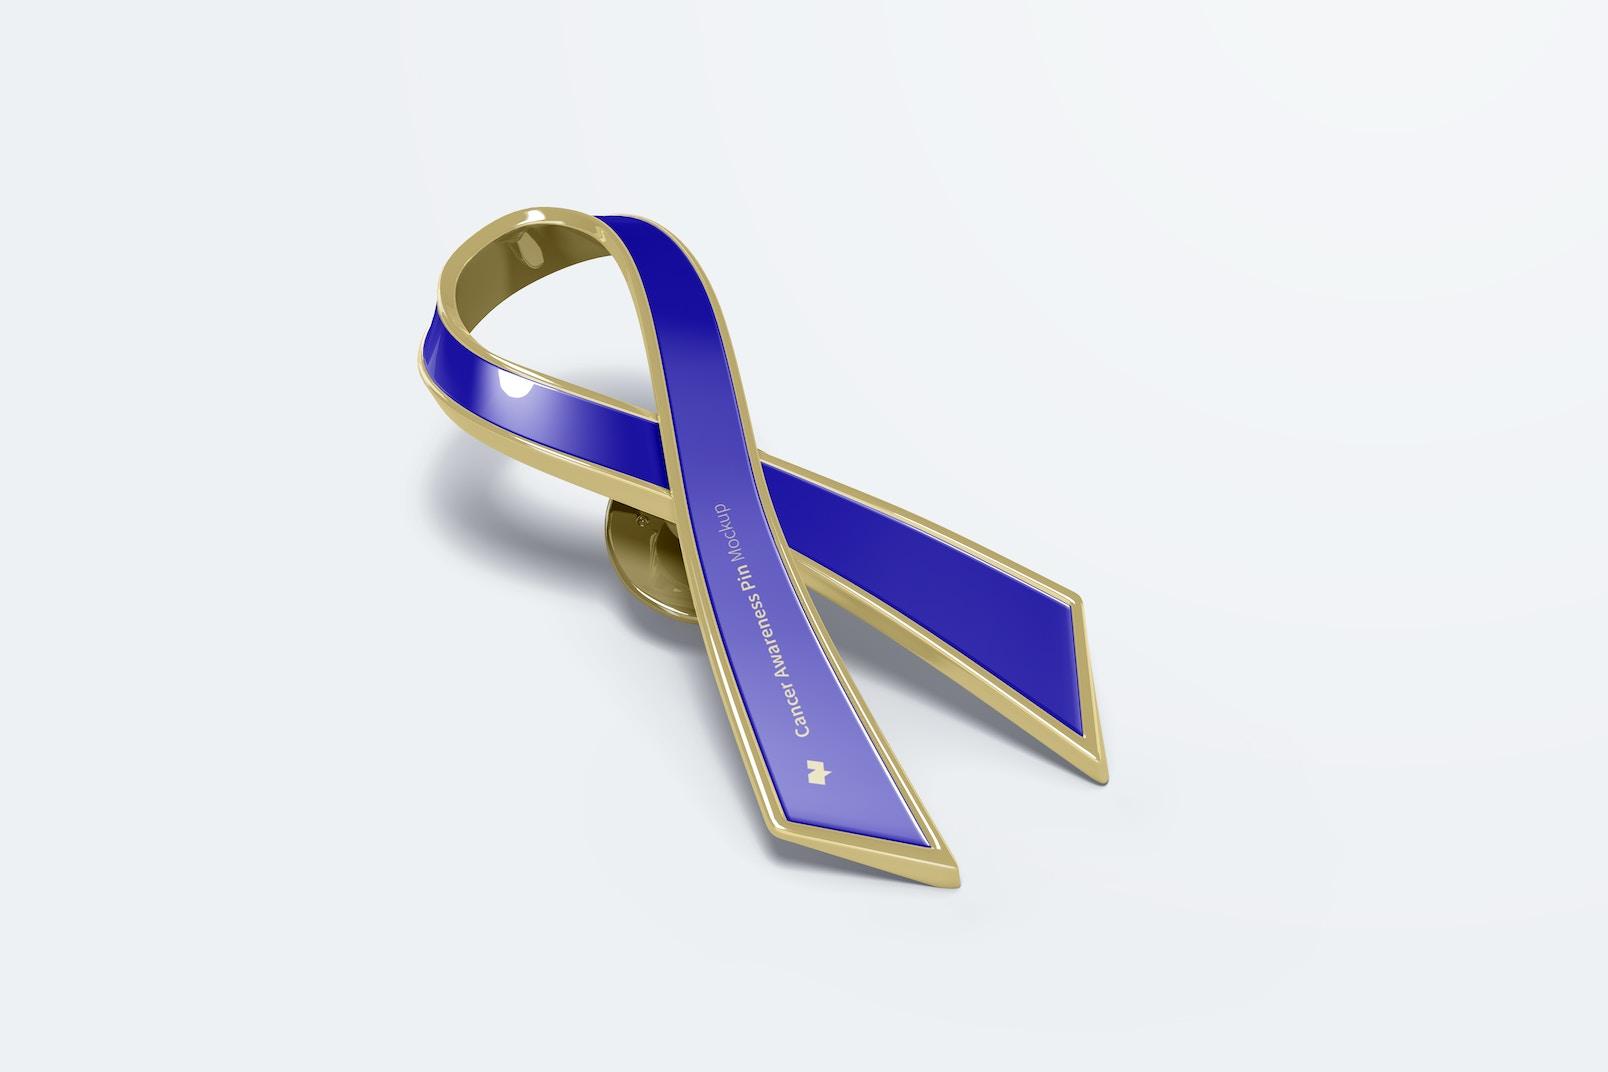 Cancer Awareness Pin Mockup, Perspective View